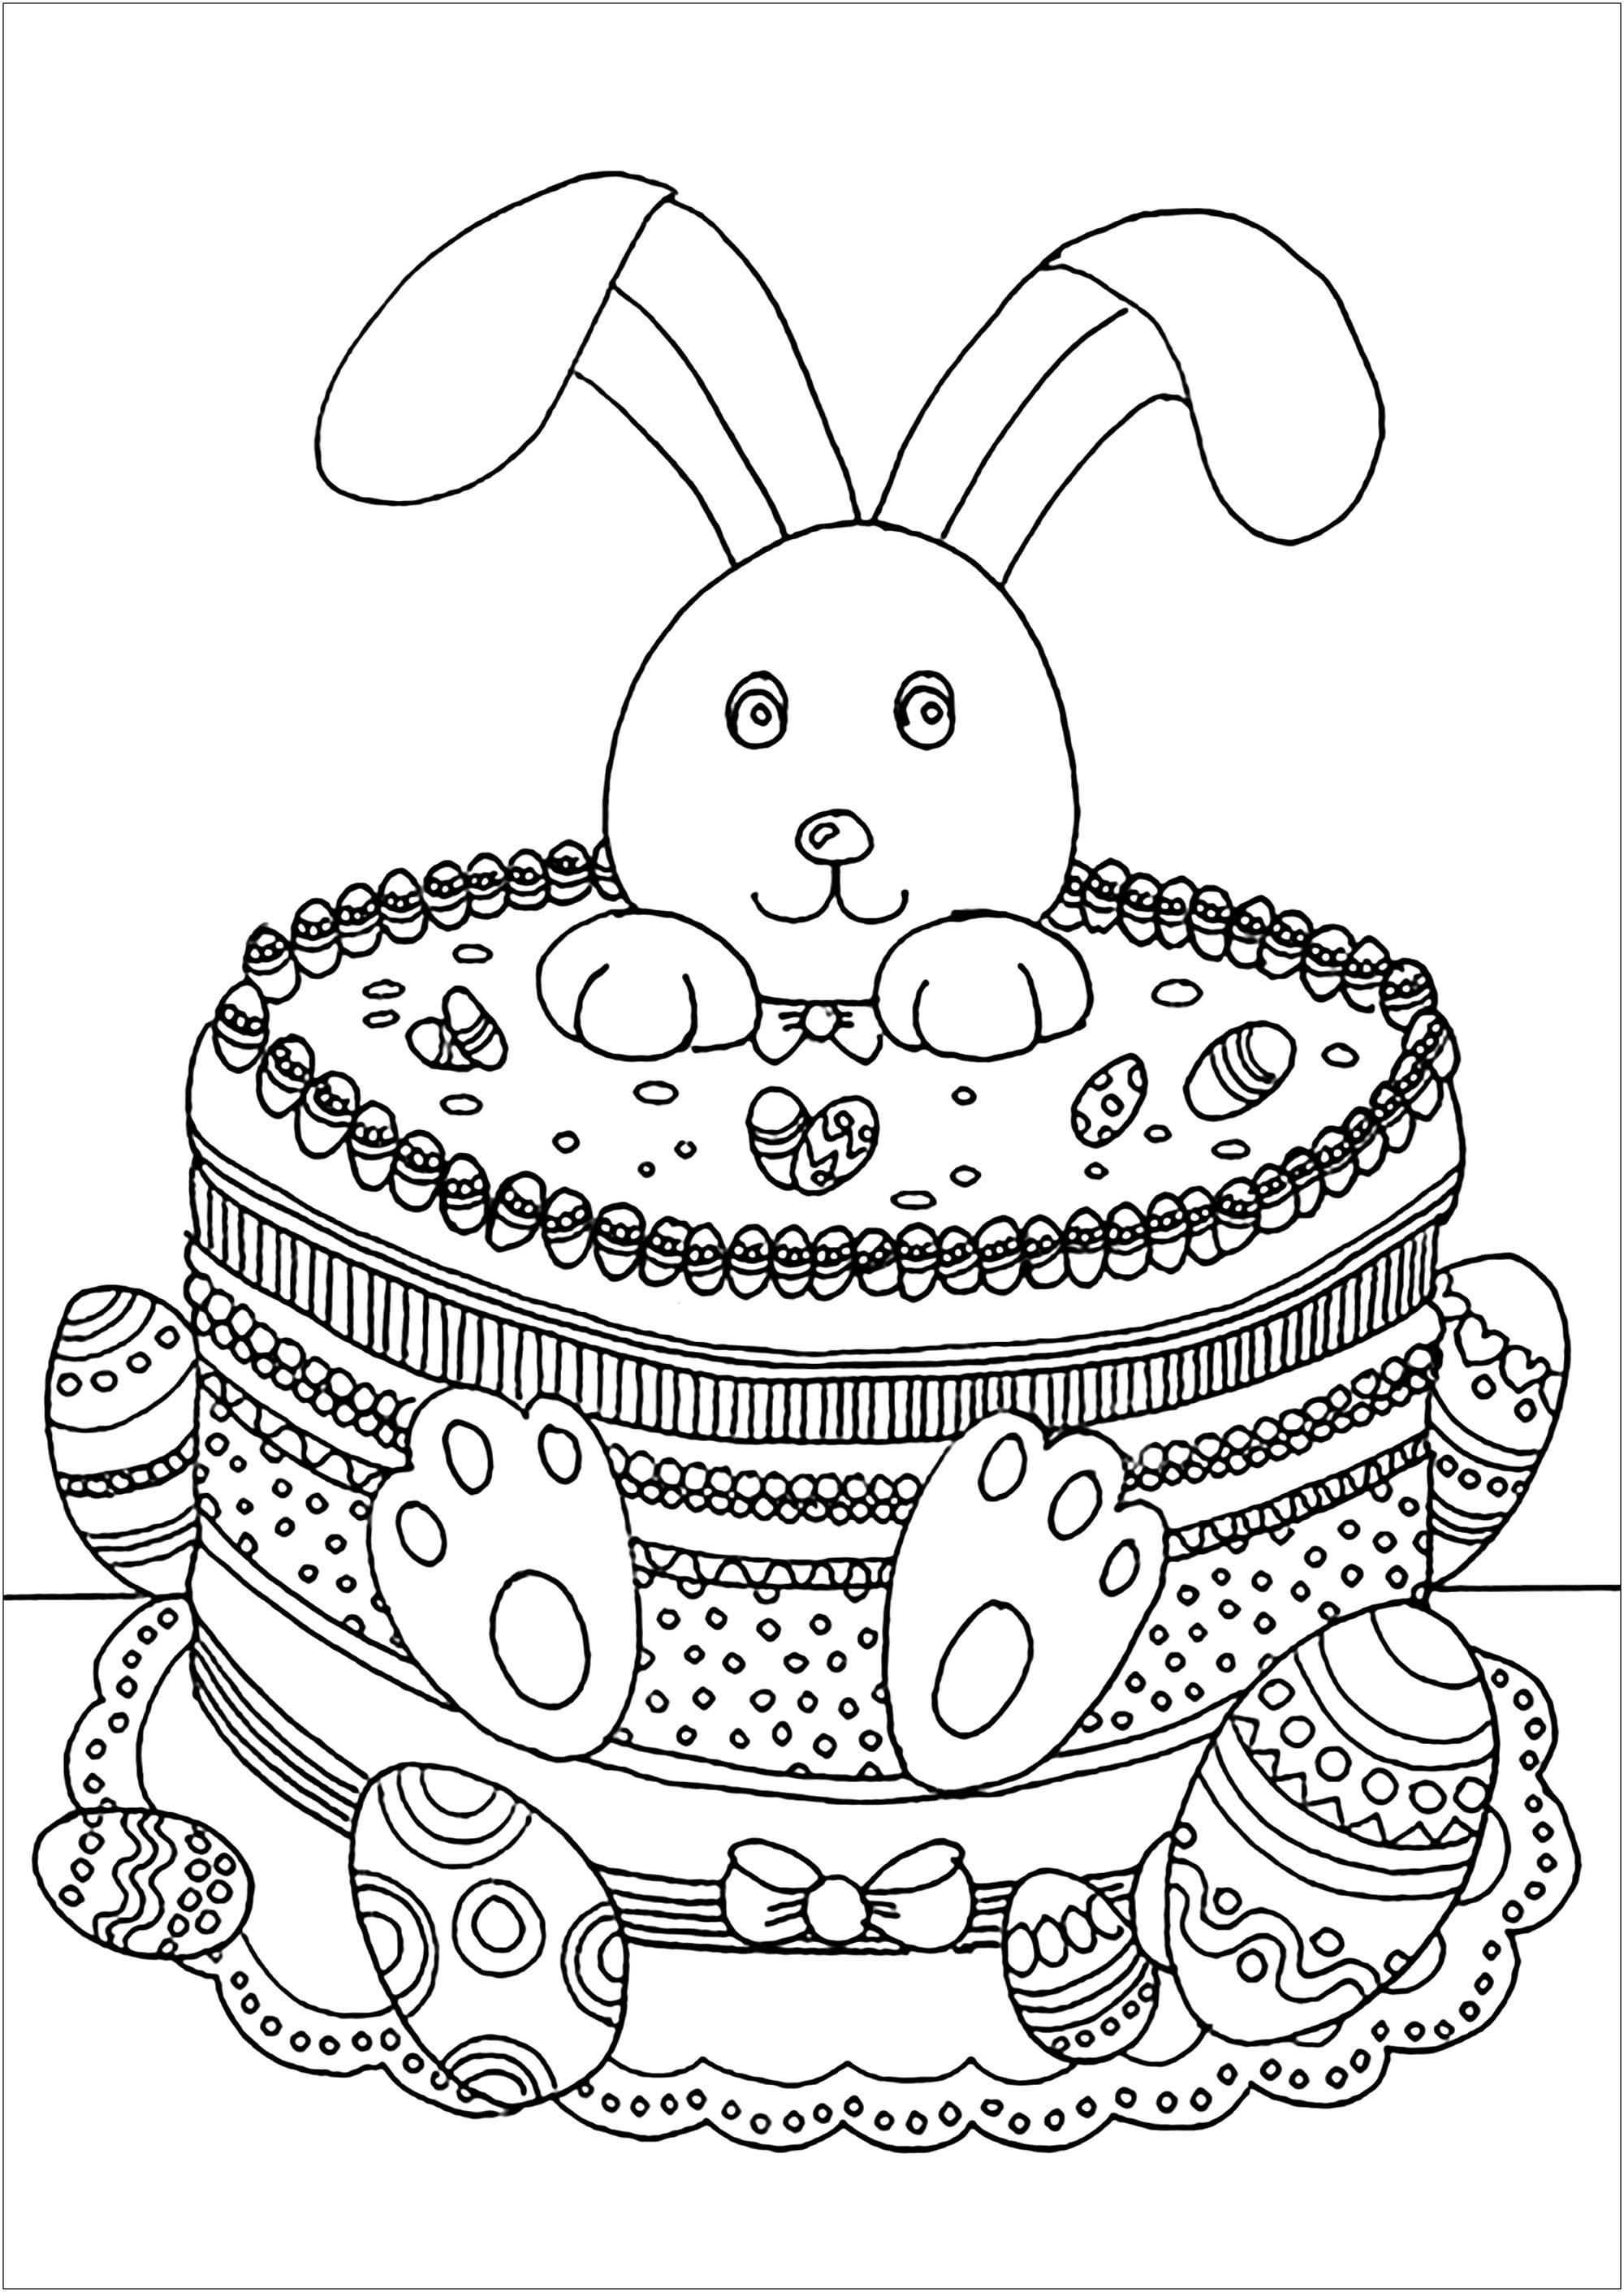 Malbuch Fur Erwachsene : Ostern - 1